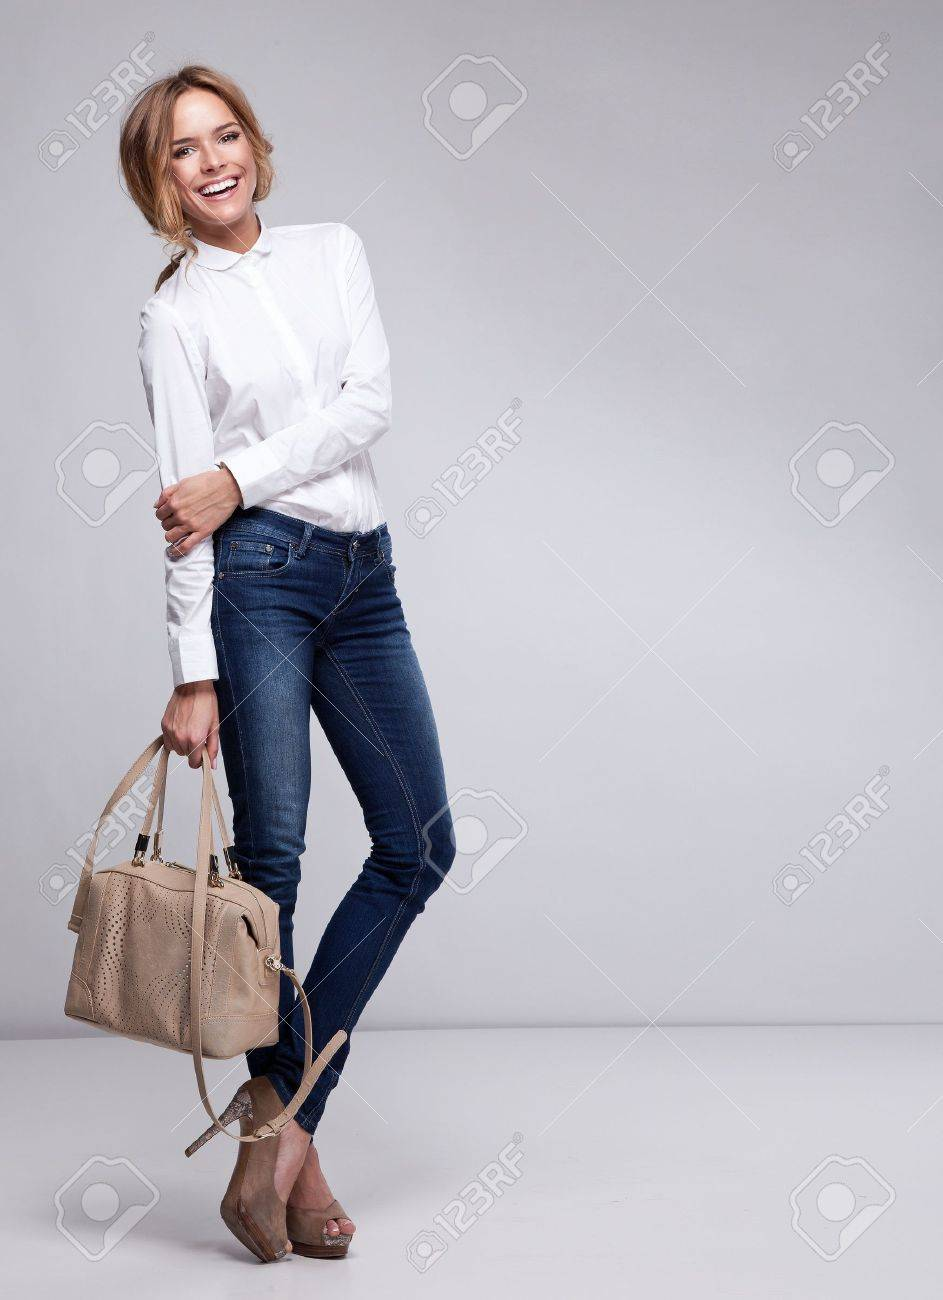 Beautiful woman holding a handbag Stock Photo - 19398790